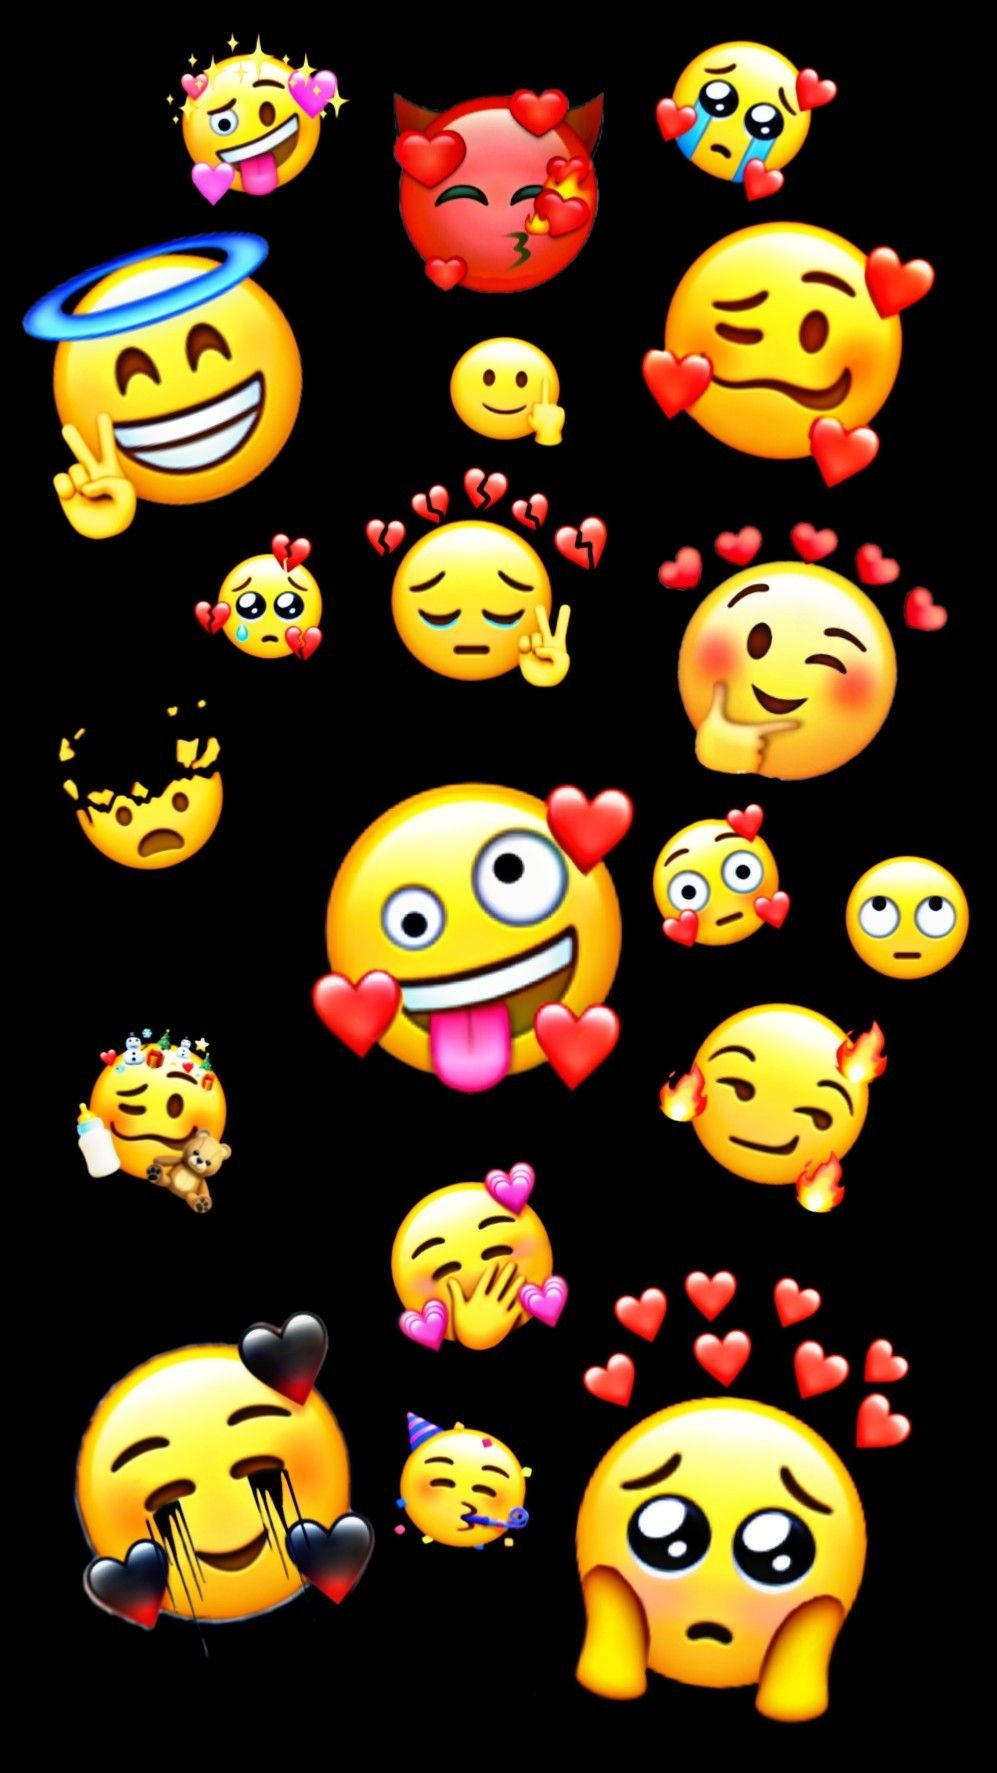 Emoji Wallpaper Cute Emoji Wallpaper In 2020 Cute Emoji Wallpaper Emoji Wallpaper Iphone Emoji Wallpaper